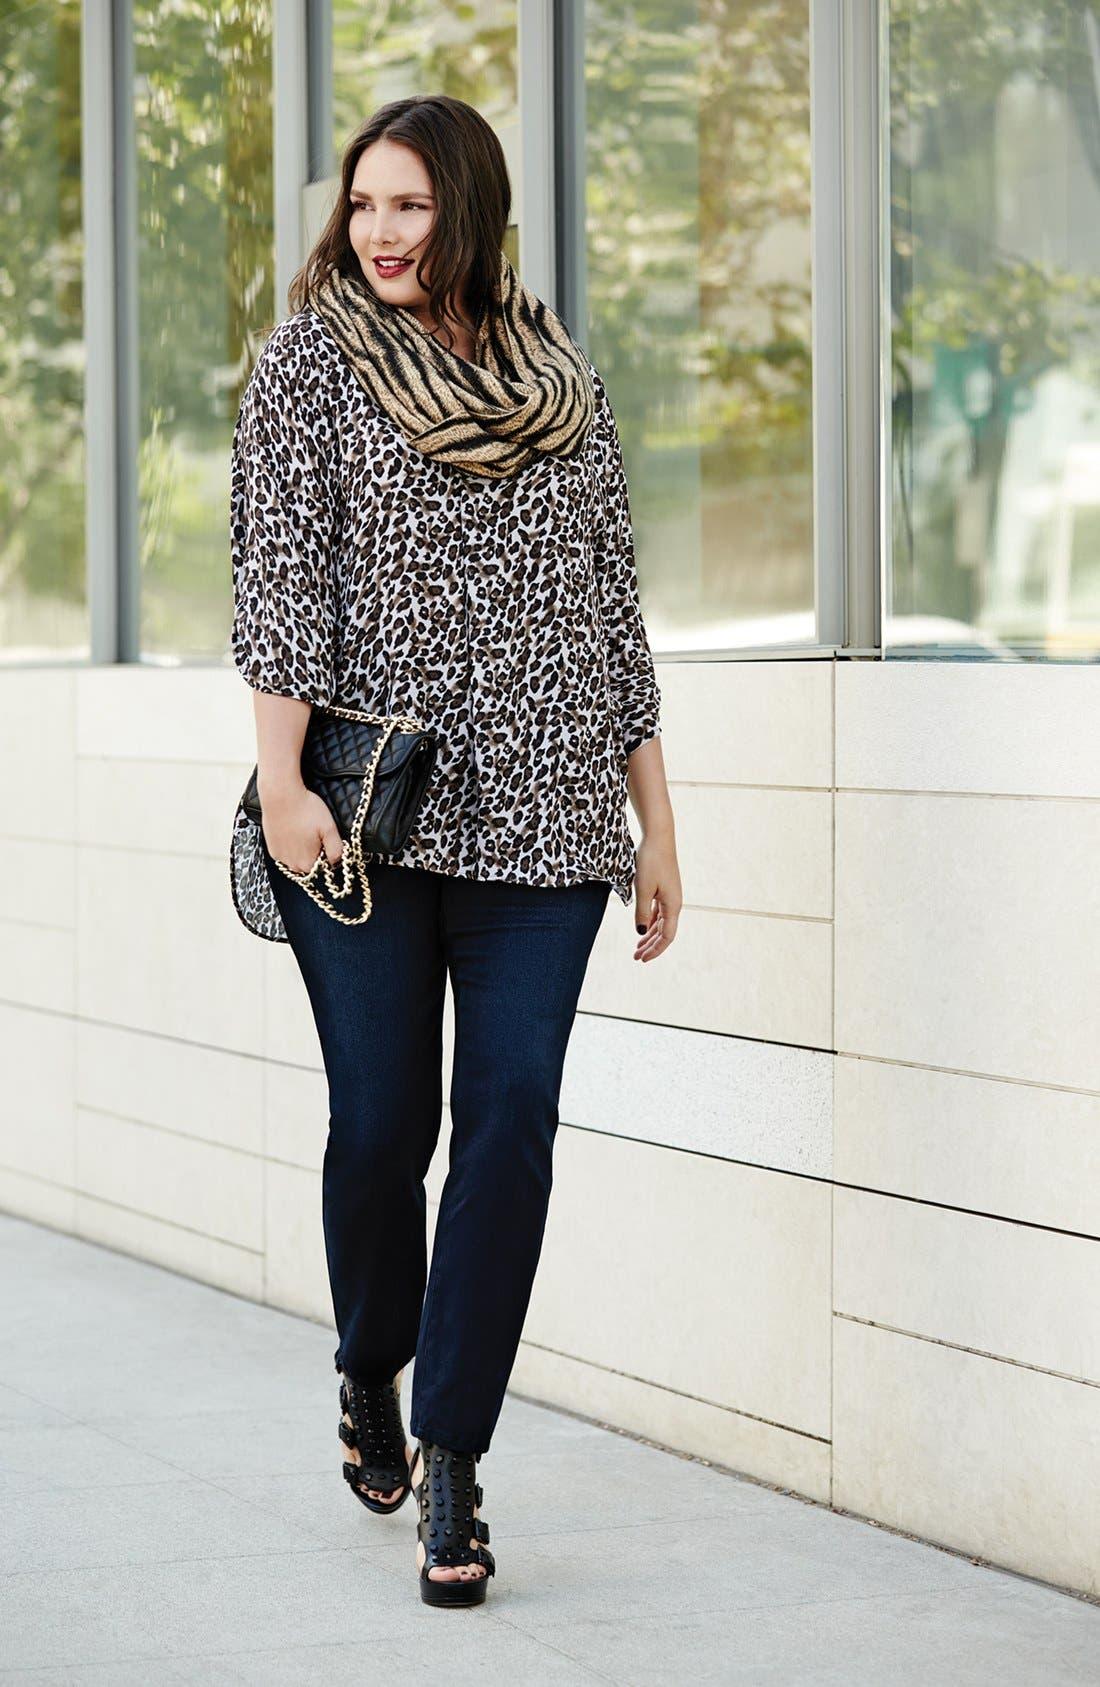 Alternate Image 1 Selected - Bellatrix Tunic Shirt & NYDJ Stretch Skinny Jeans (Plus Size)